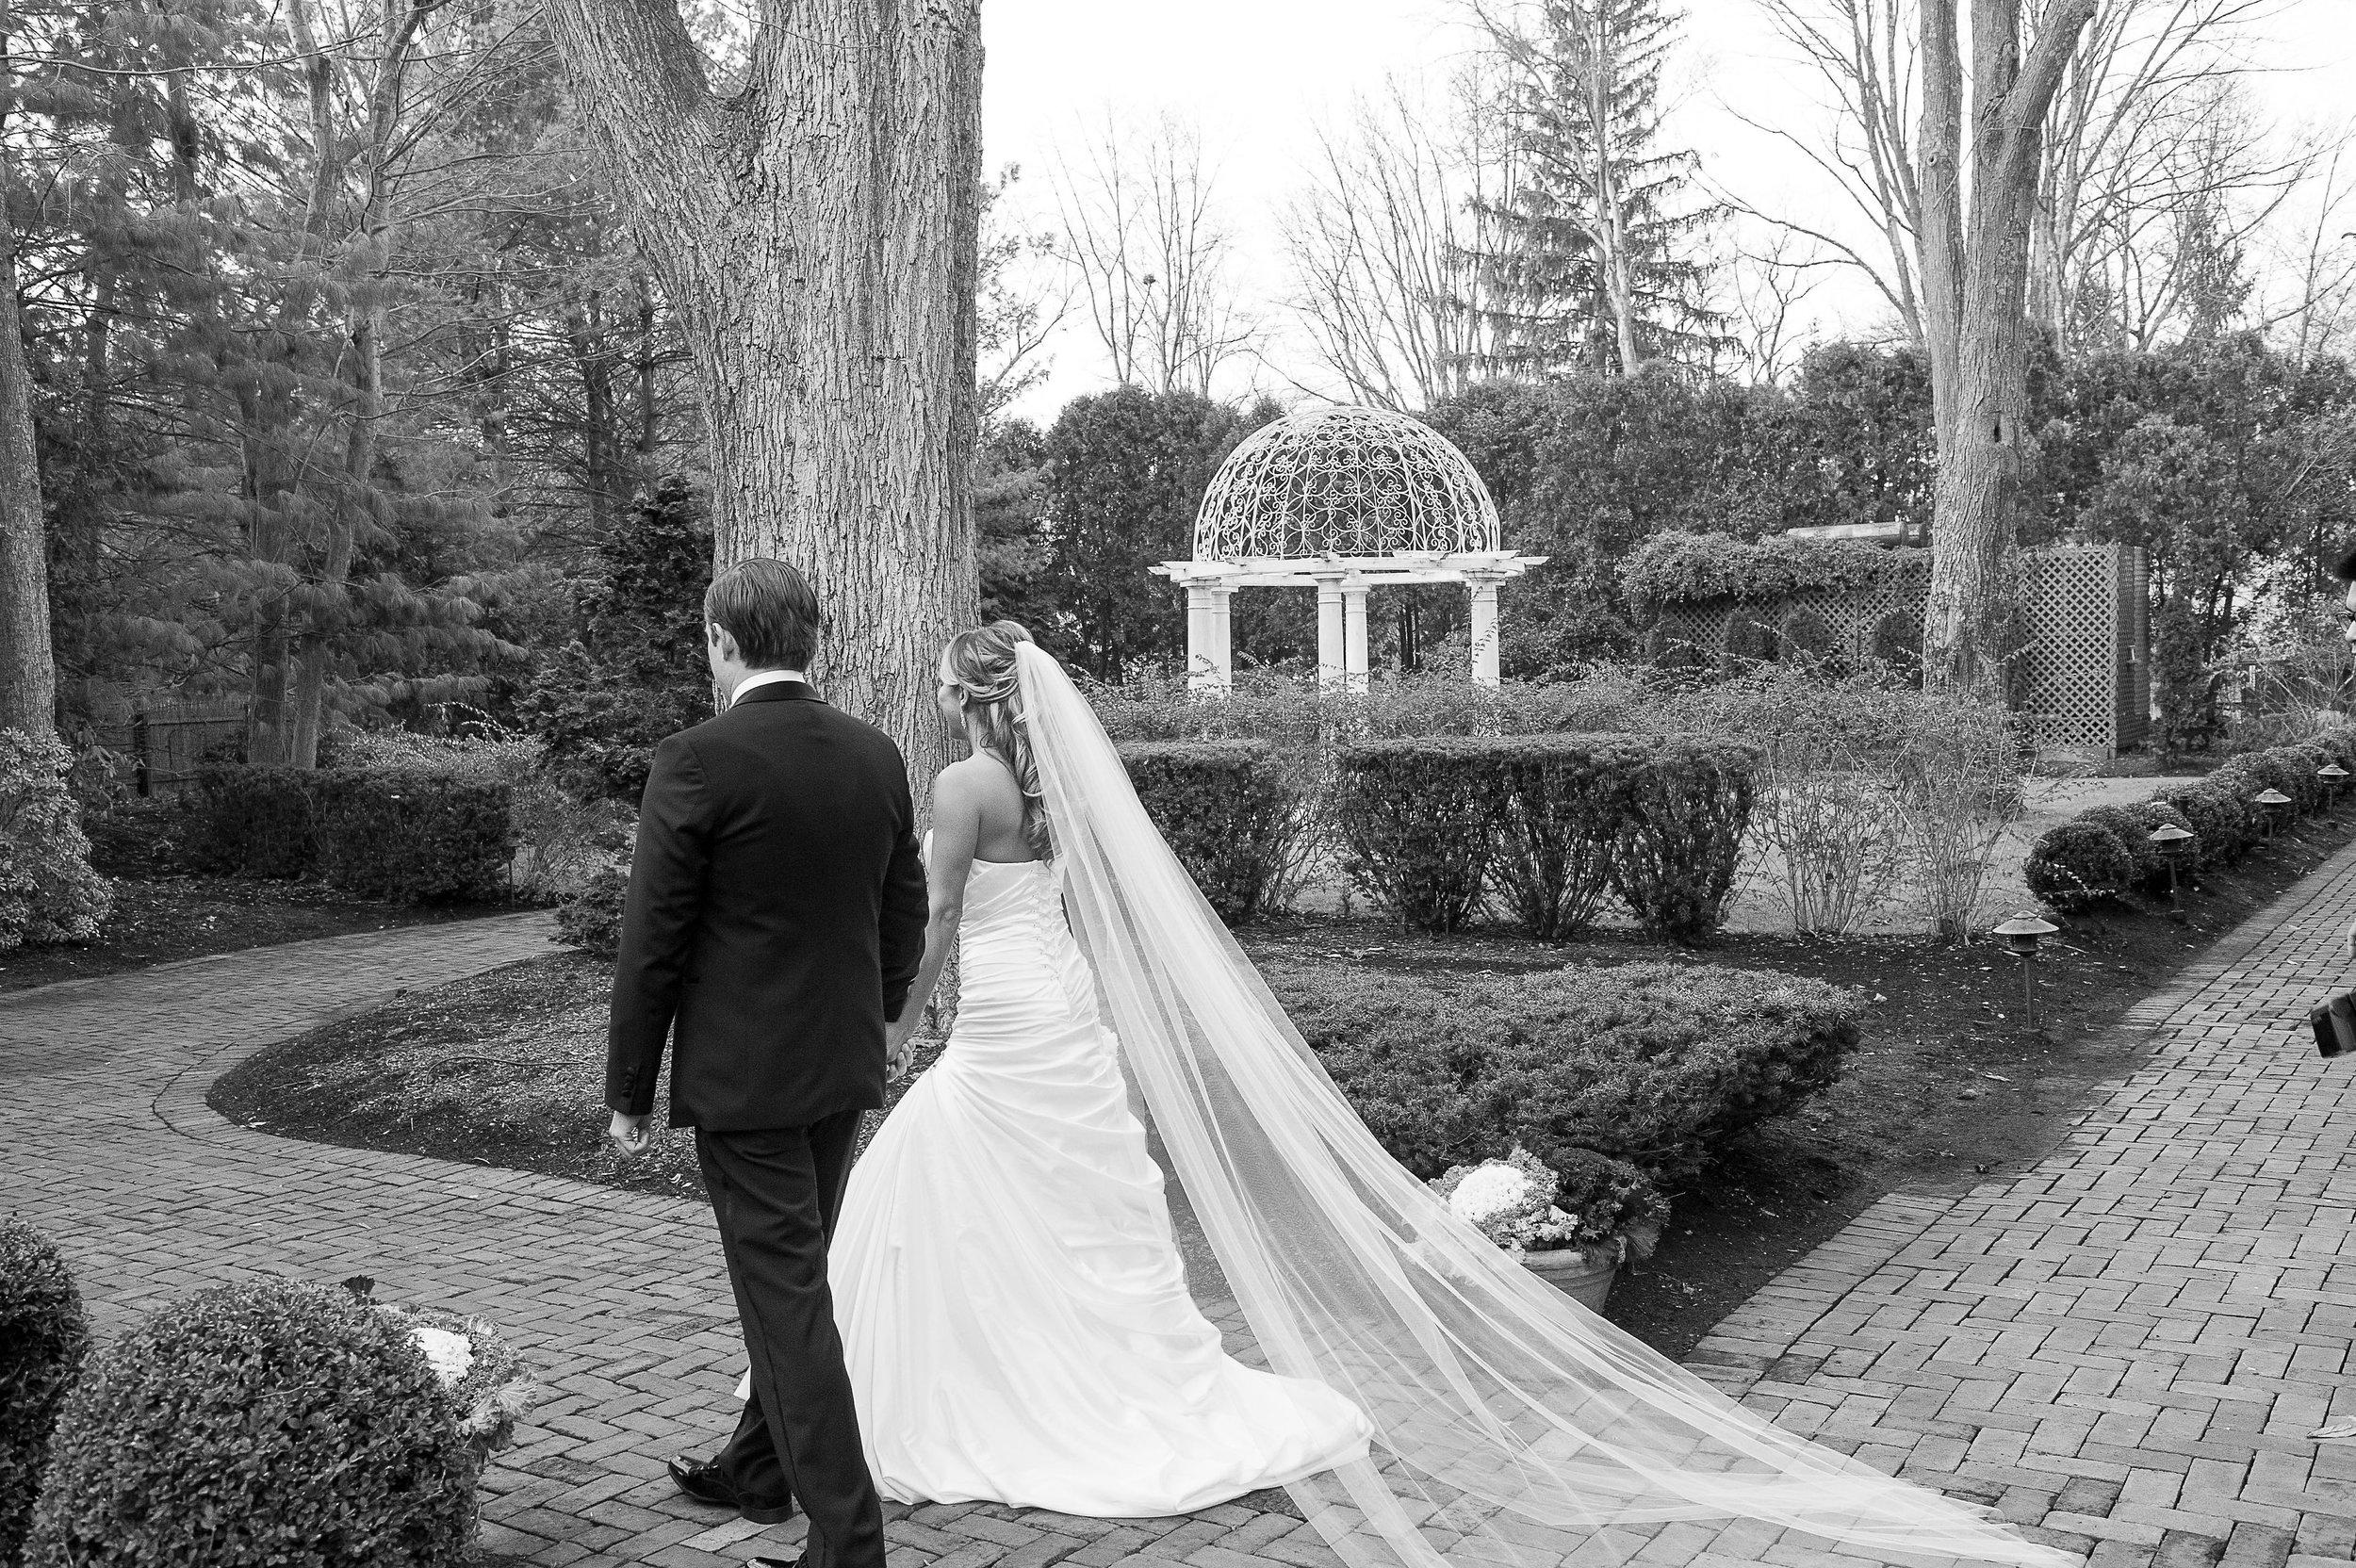 Ceci_New_York_Custom_Invitation_ New_Jersey_Wedding_Luxury_Personalized_Ceci_Style_Bride_Foil_Stamping102.JPG